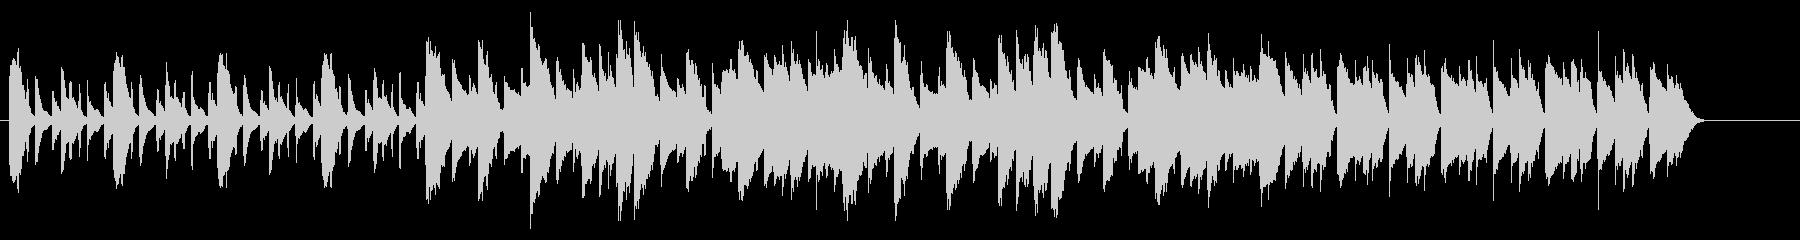 SNS広告 ピアノメイン ミニマル1の未再生の波形